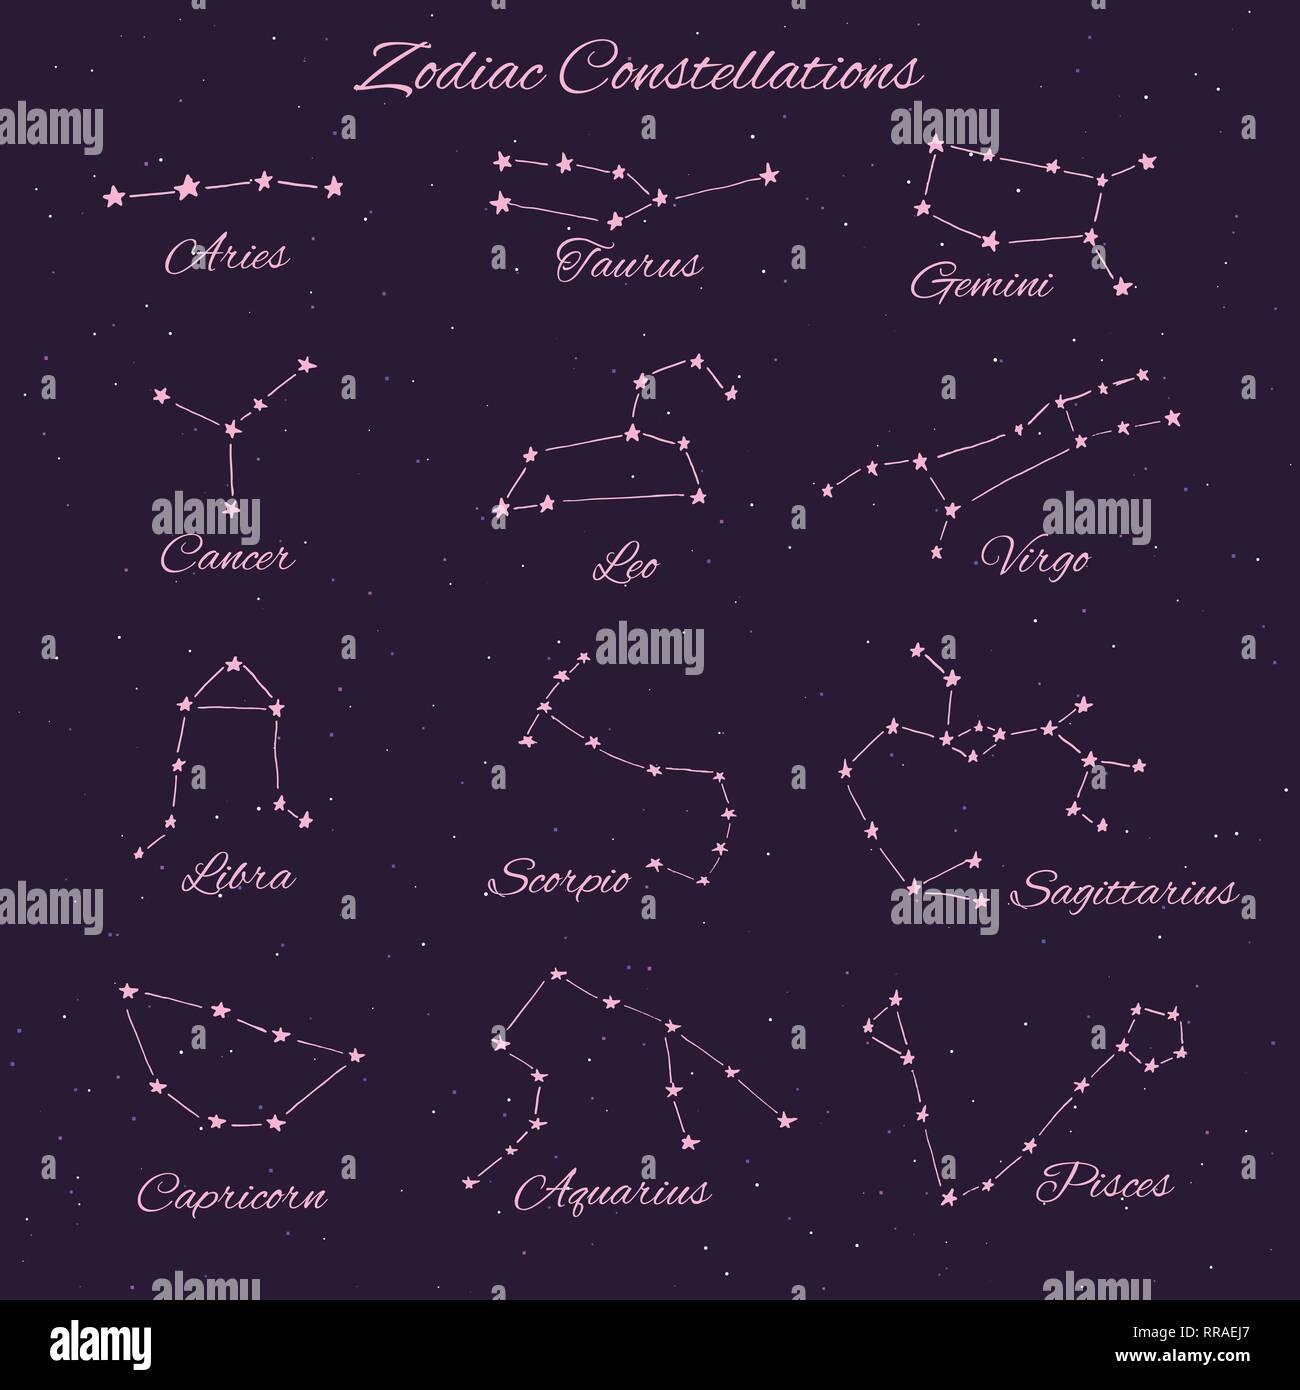 Sagittarius und Gemini datieren